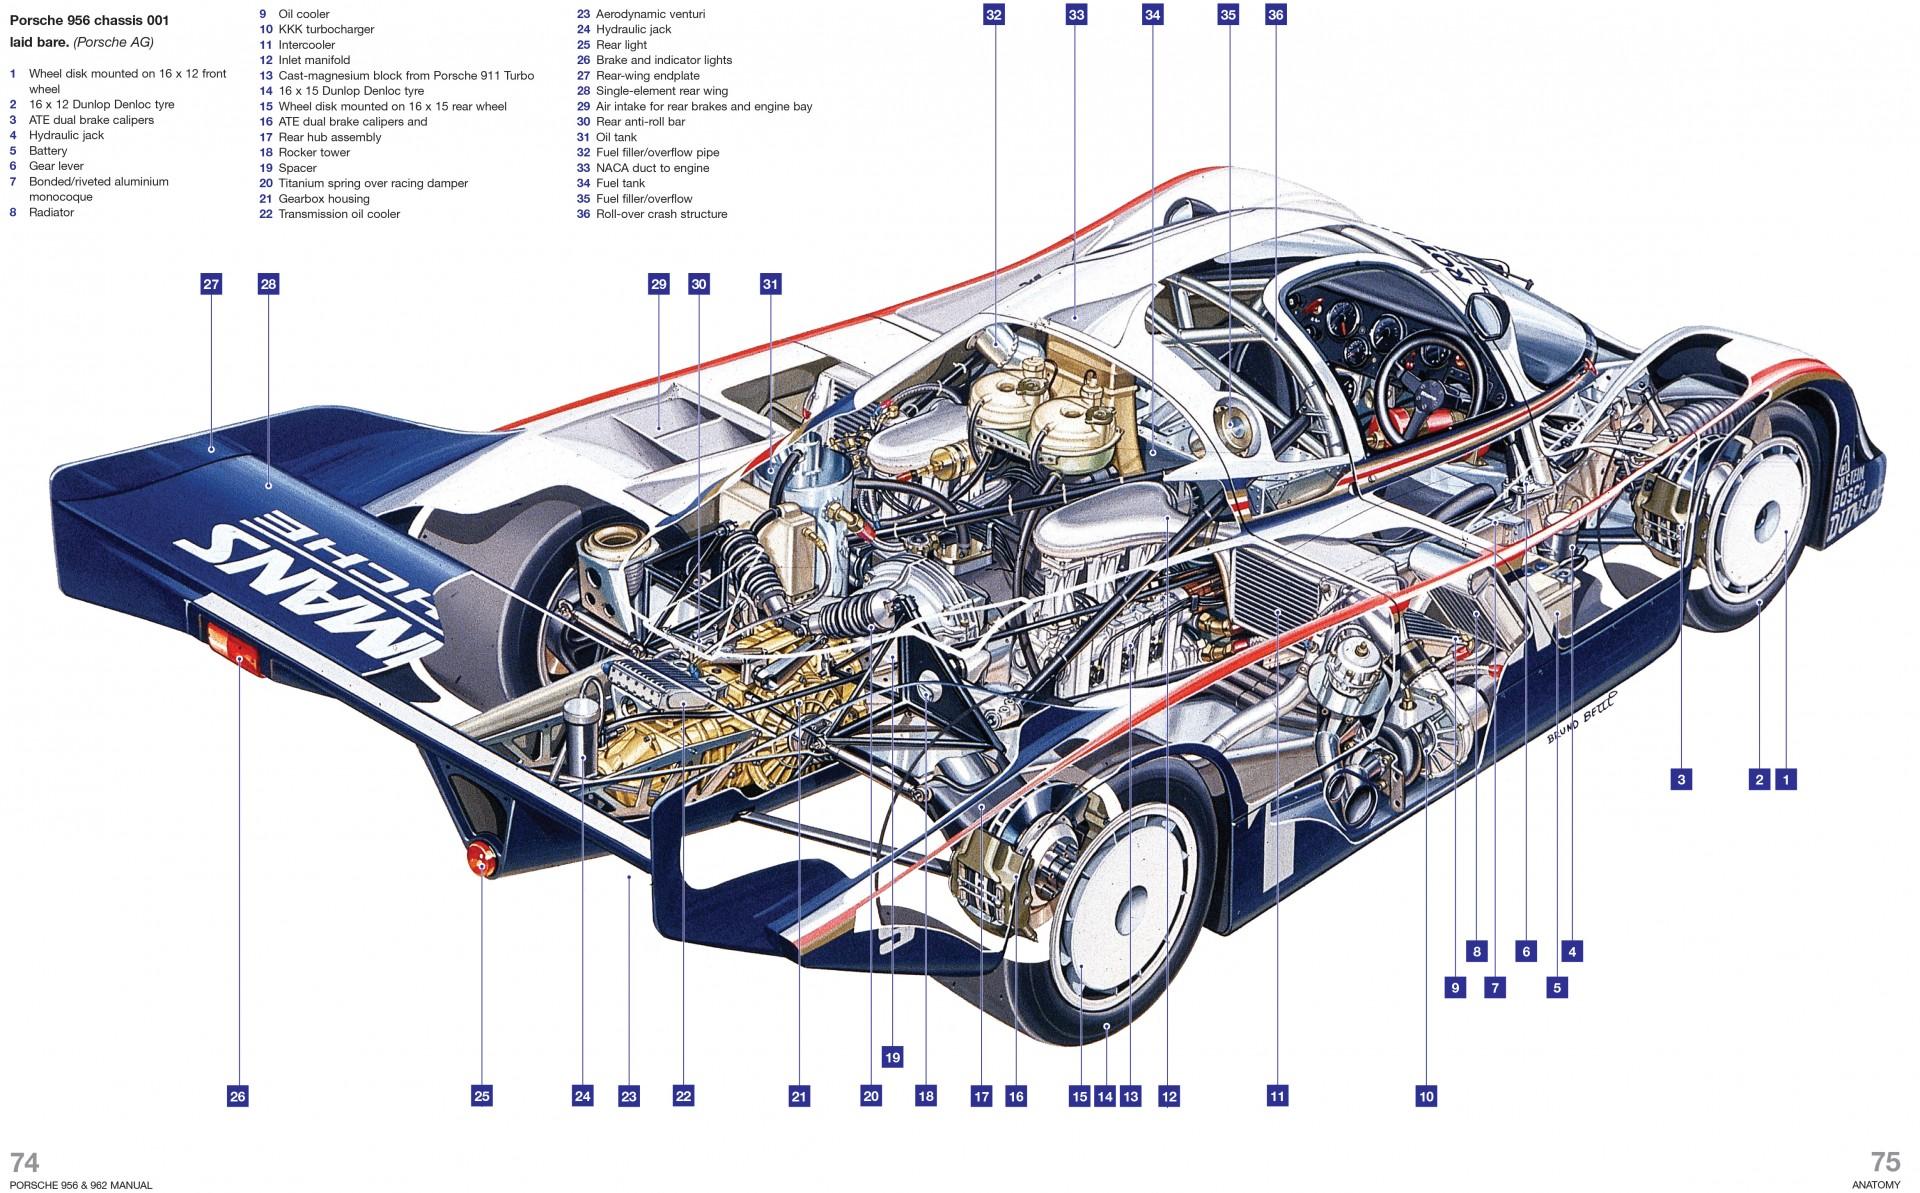 Porsche 956 and 962 Workshop Manual